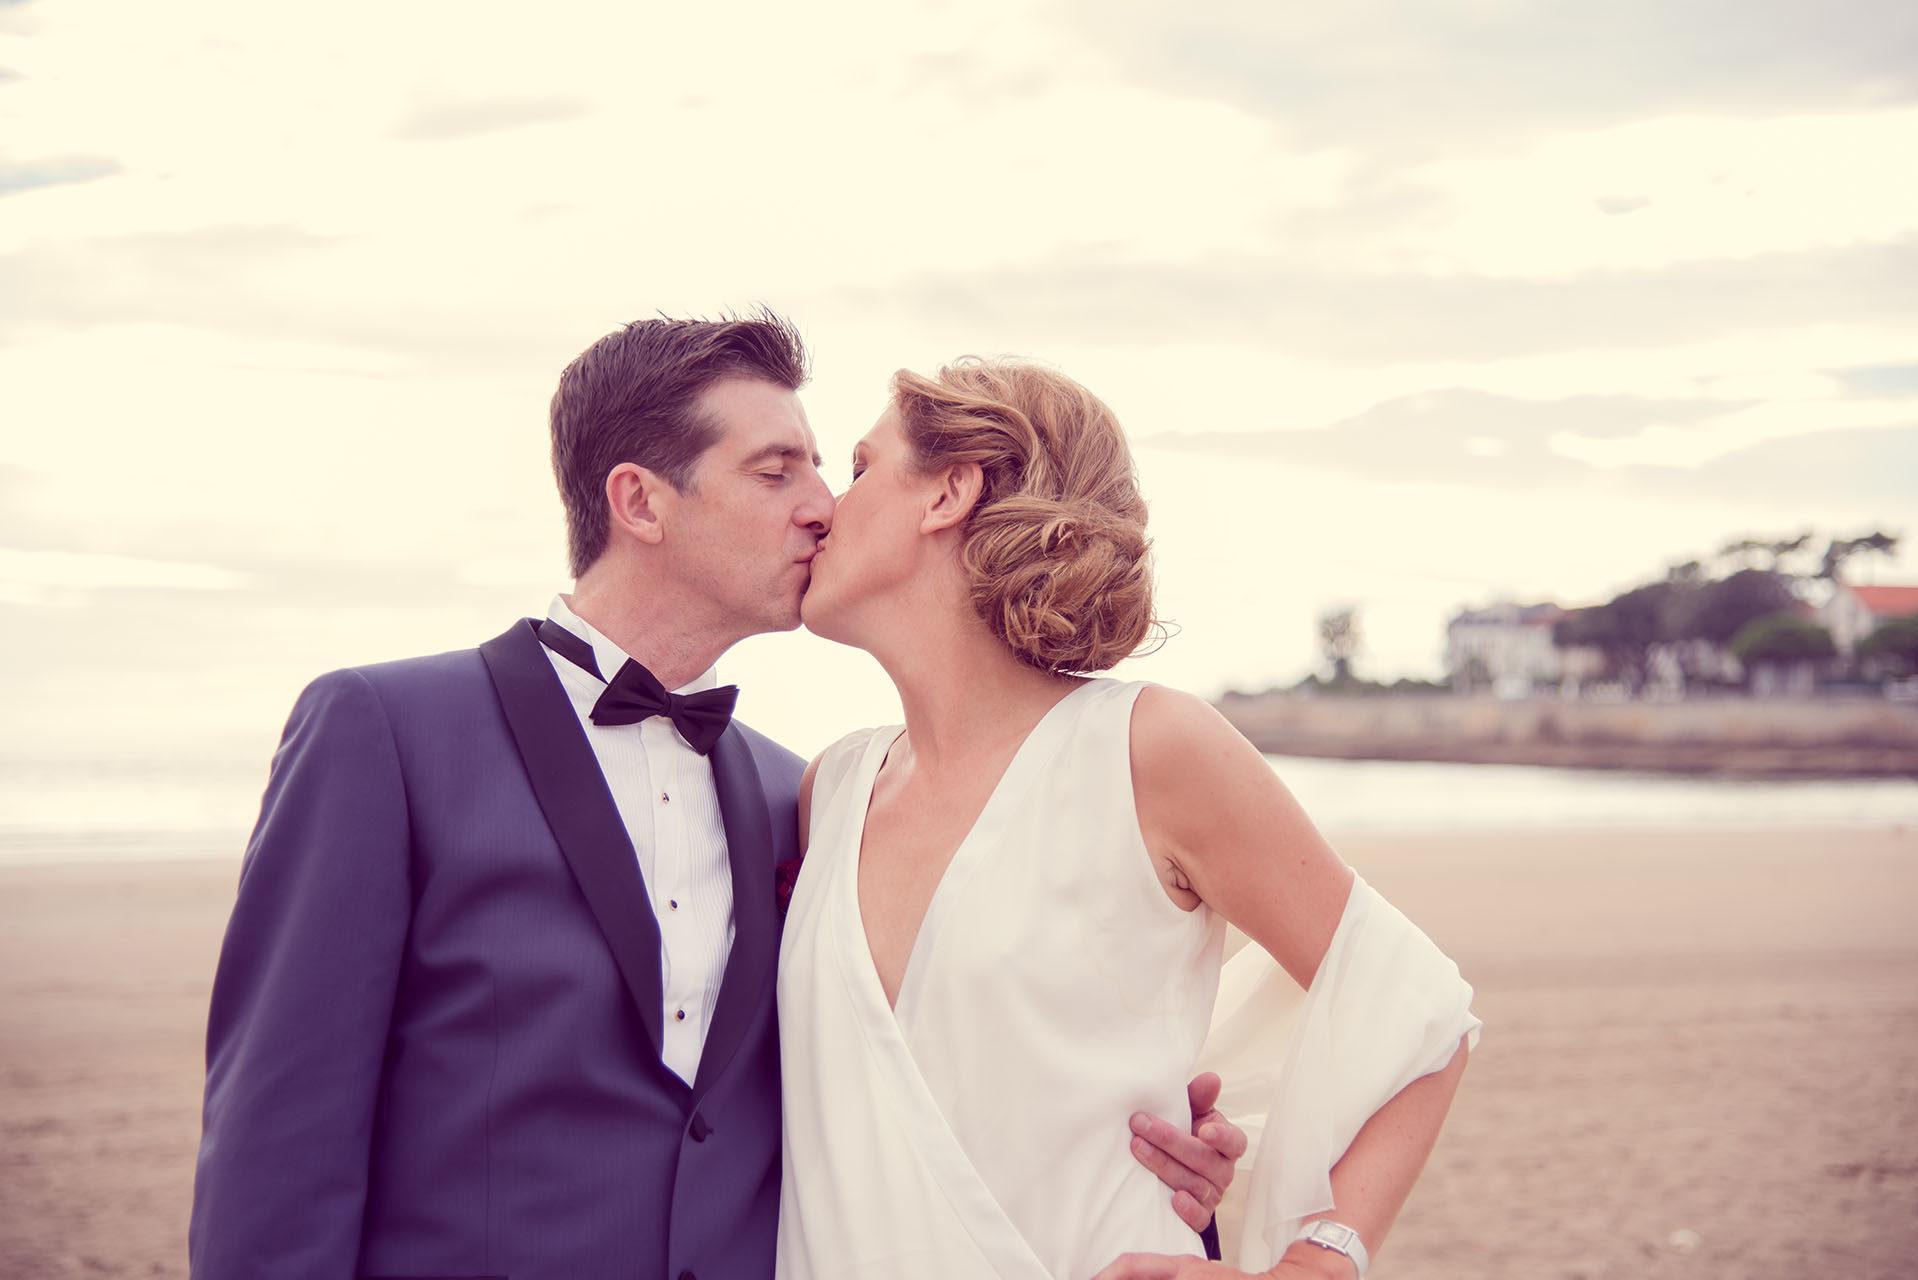 photographe-ile-de-france-mariage-yasmine-philippe-seine-saint-denis